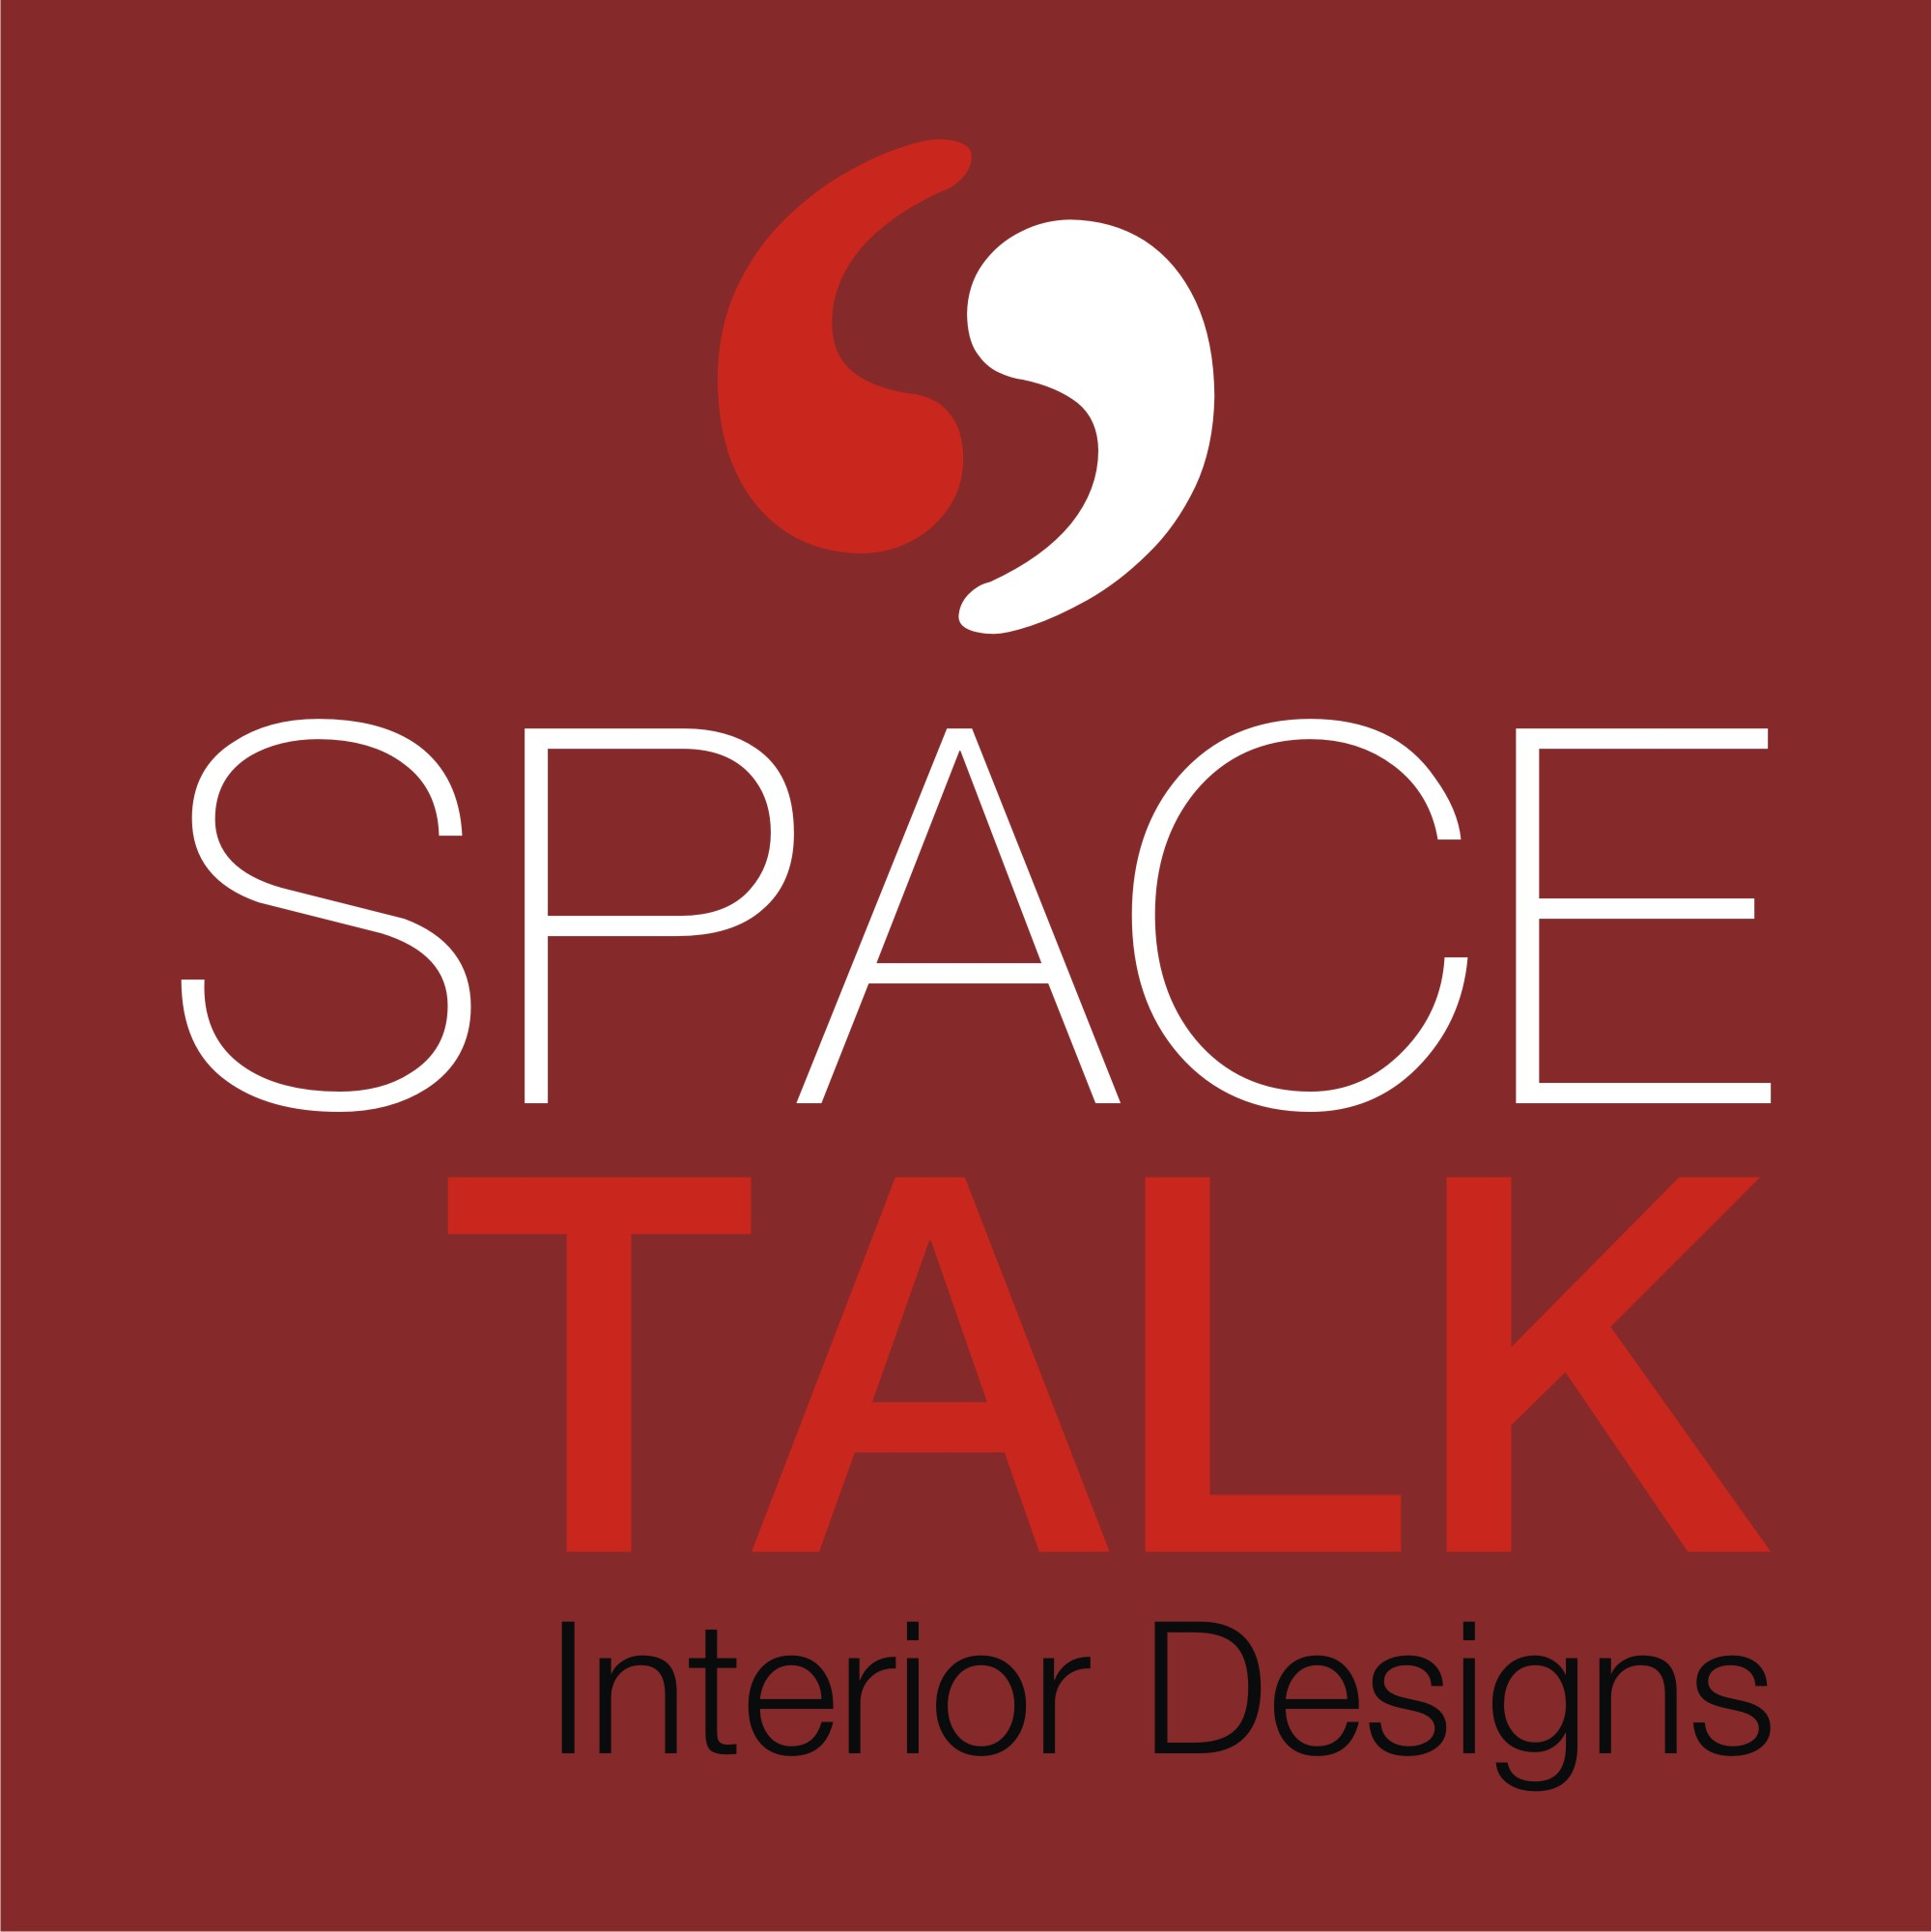 Space talk interior designs.jpg